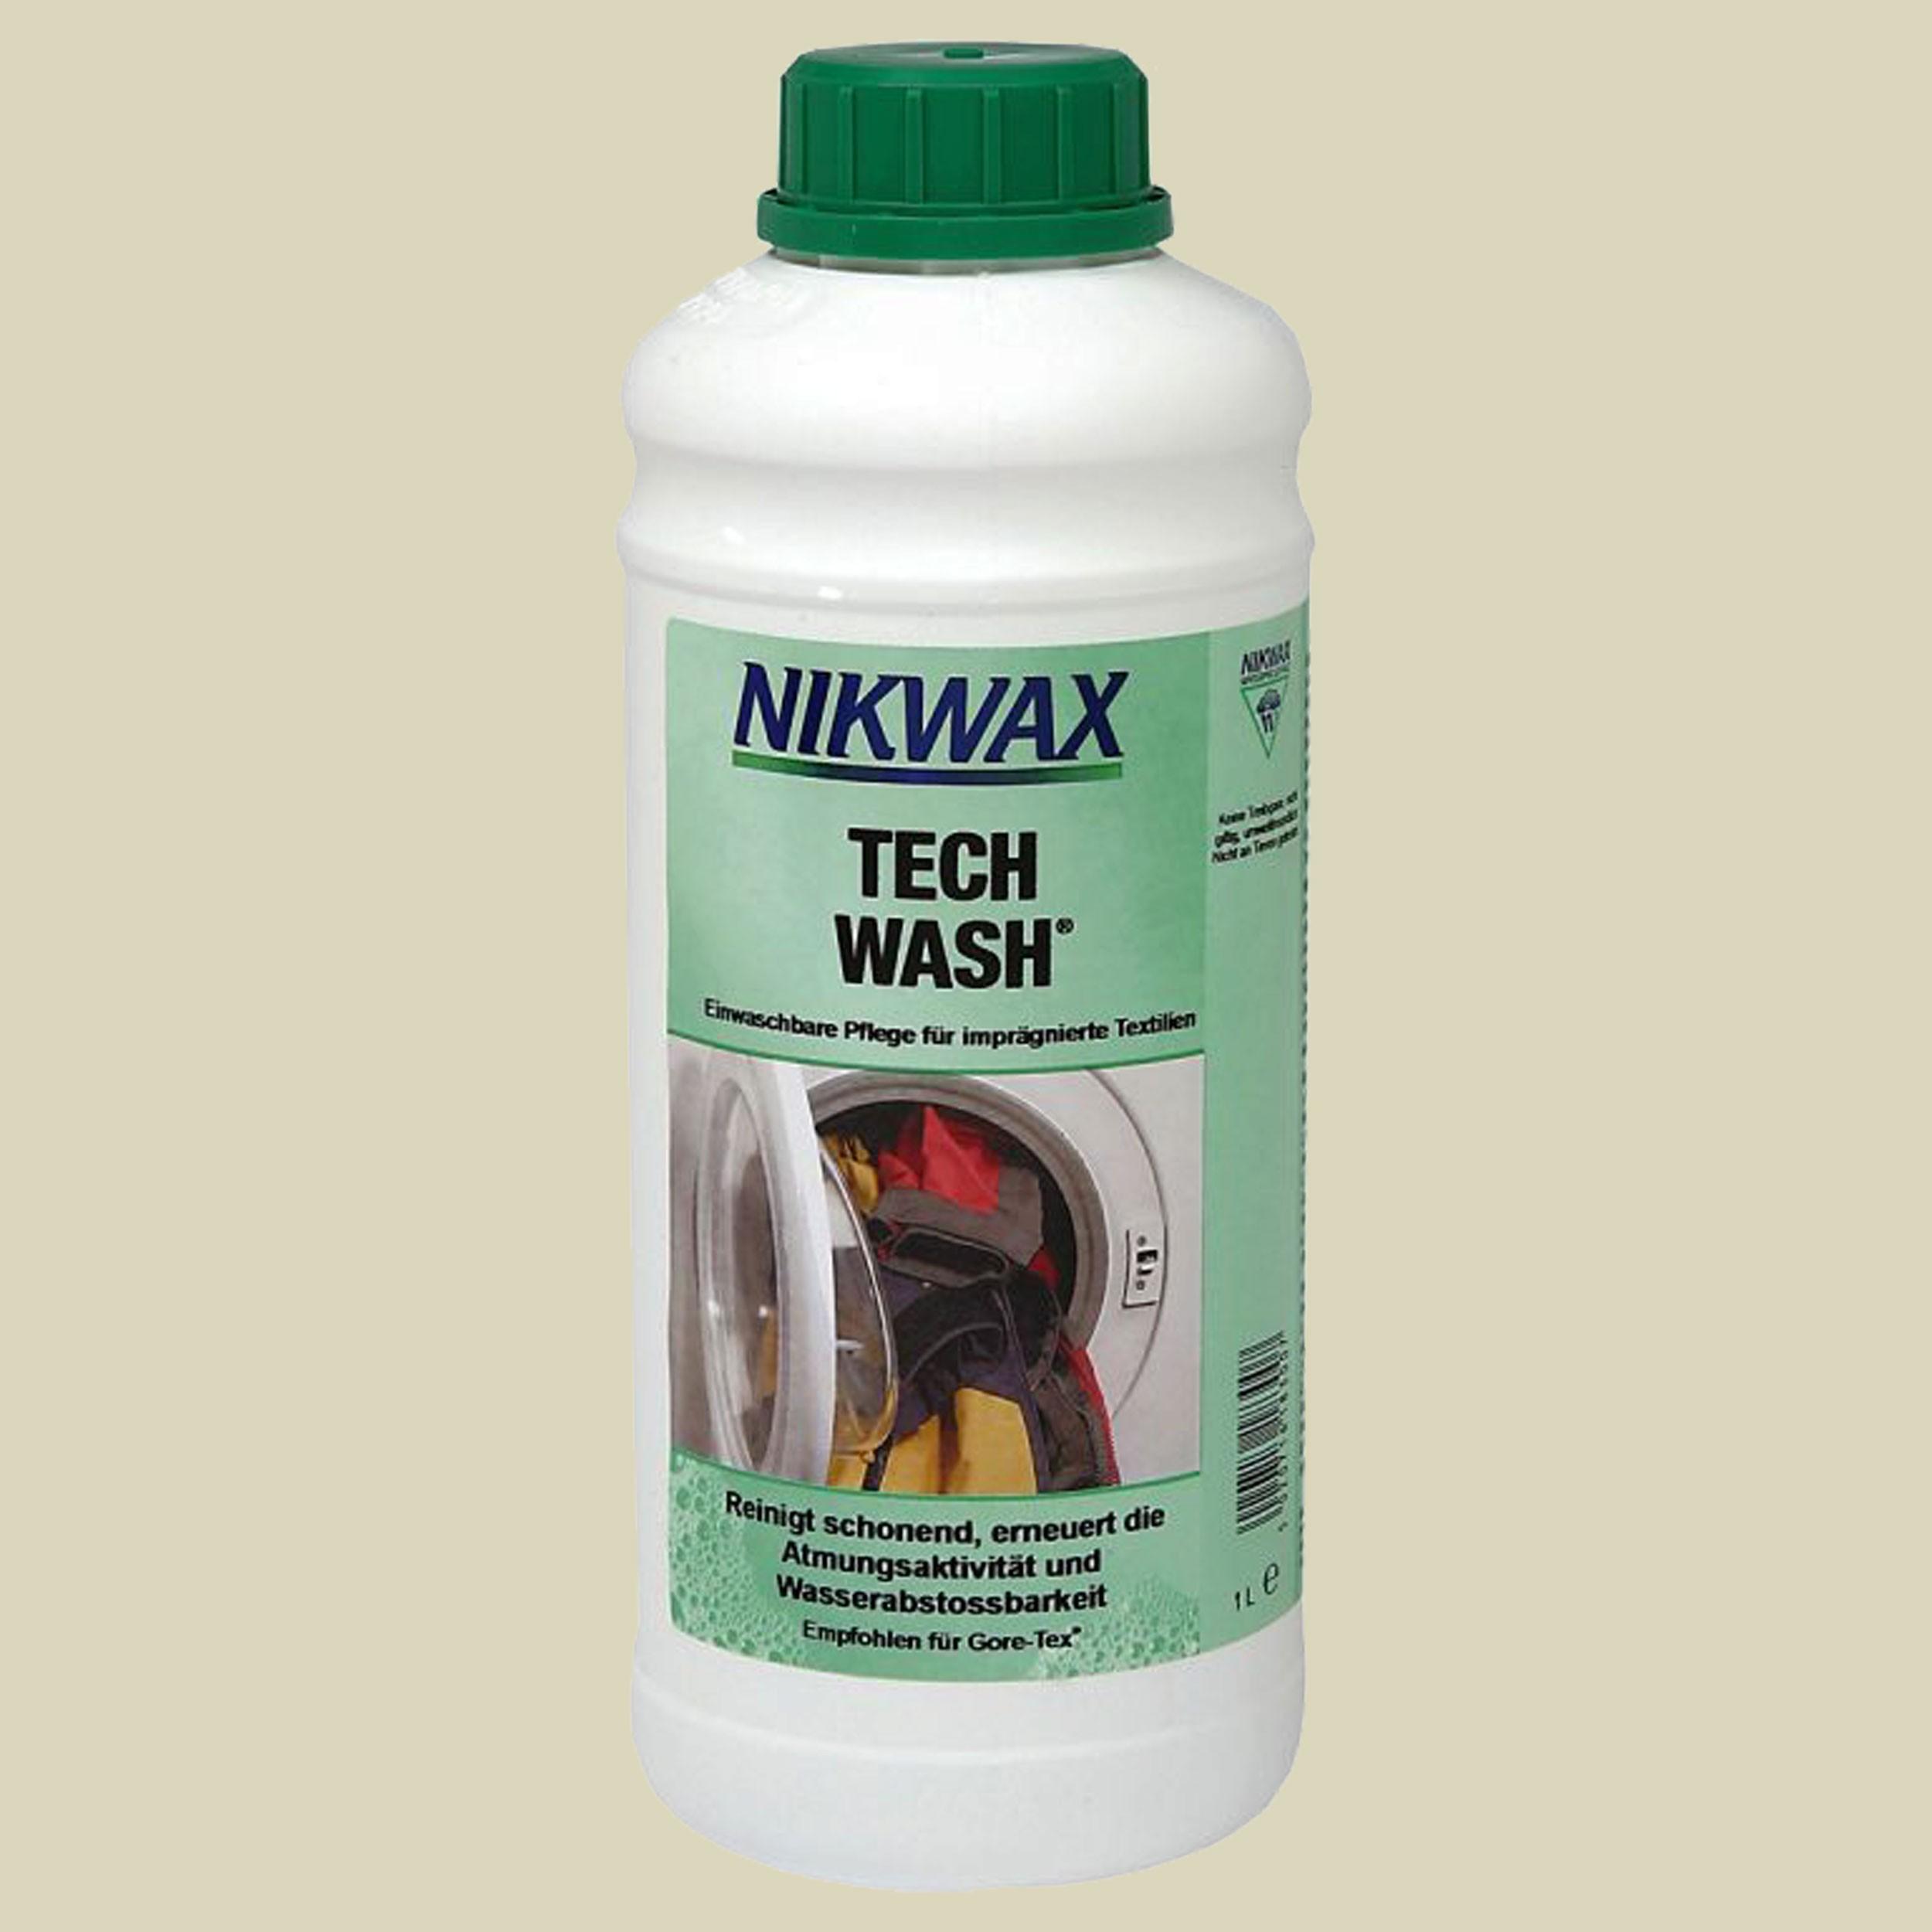 nikwax_tech_wash_183P01_1Liter_fallback